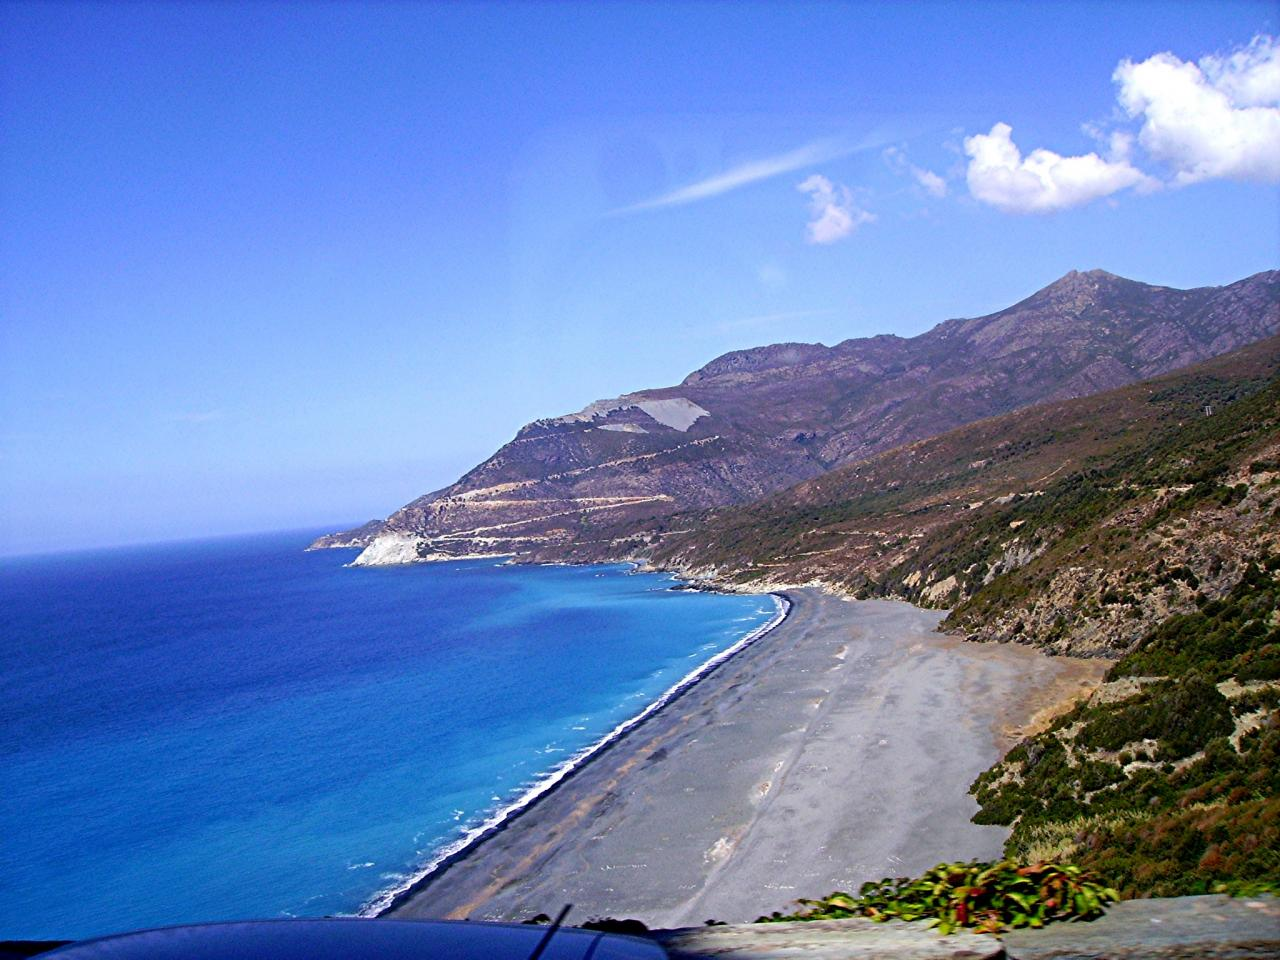 Corse 14-21 sept 2013 (35)